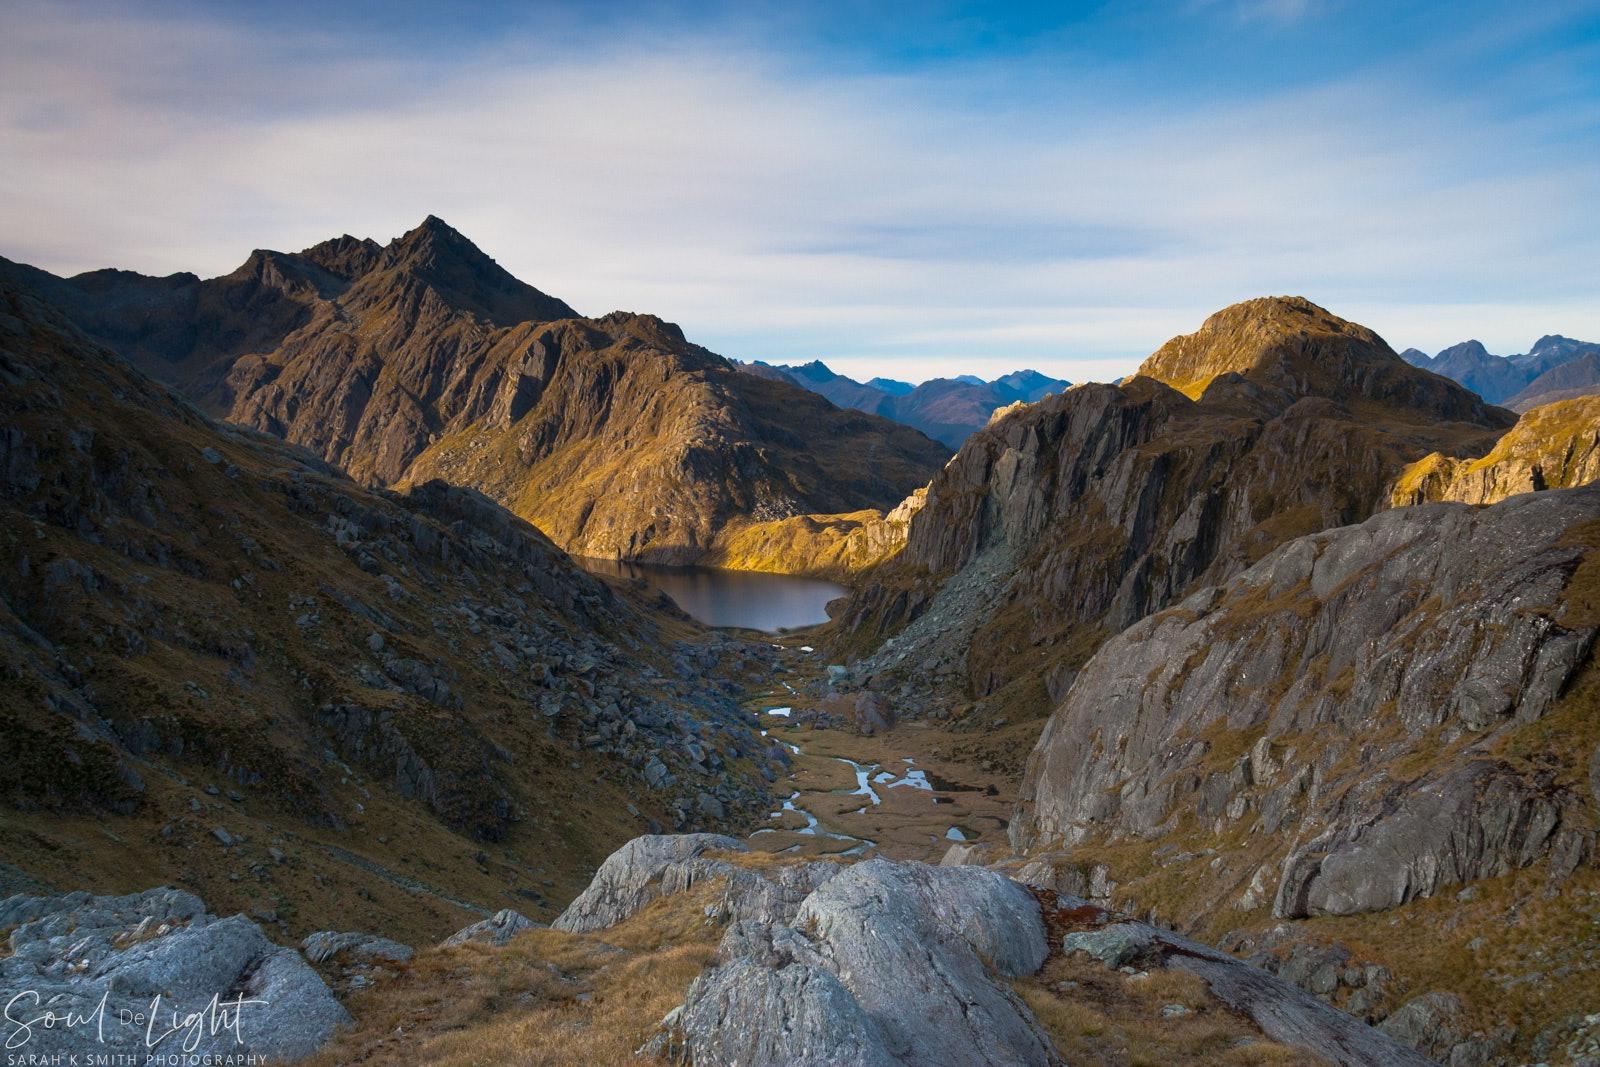 Valley of the Trolls - Mt Aspiring National Park